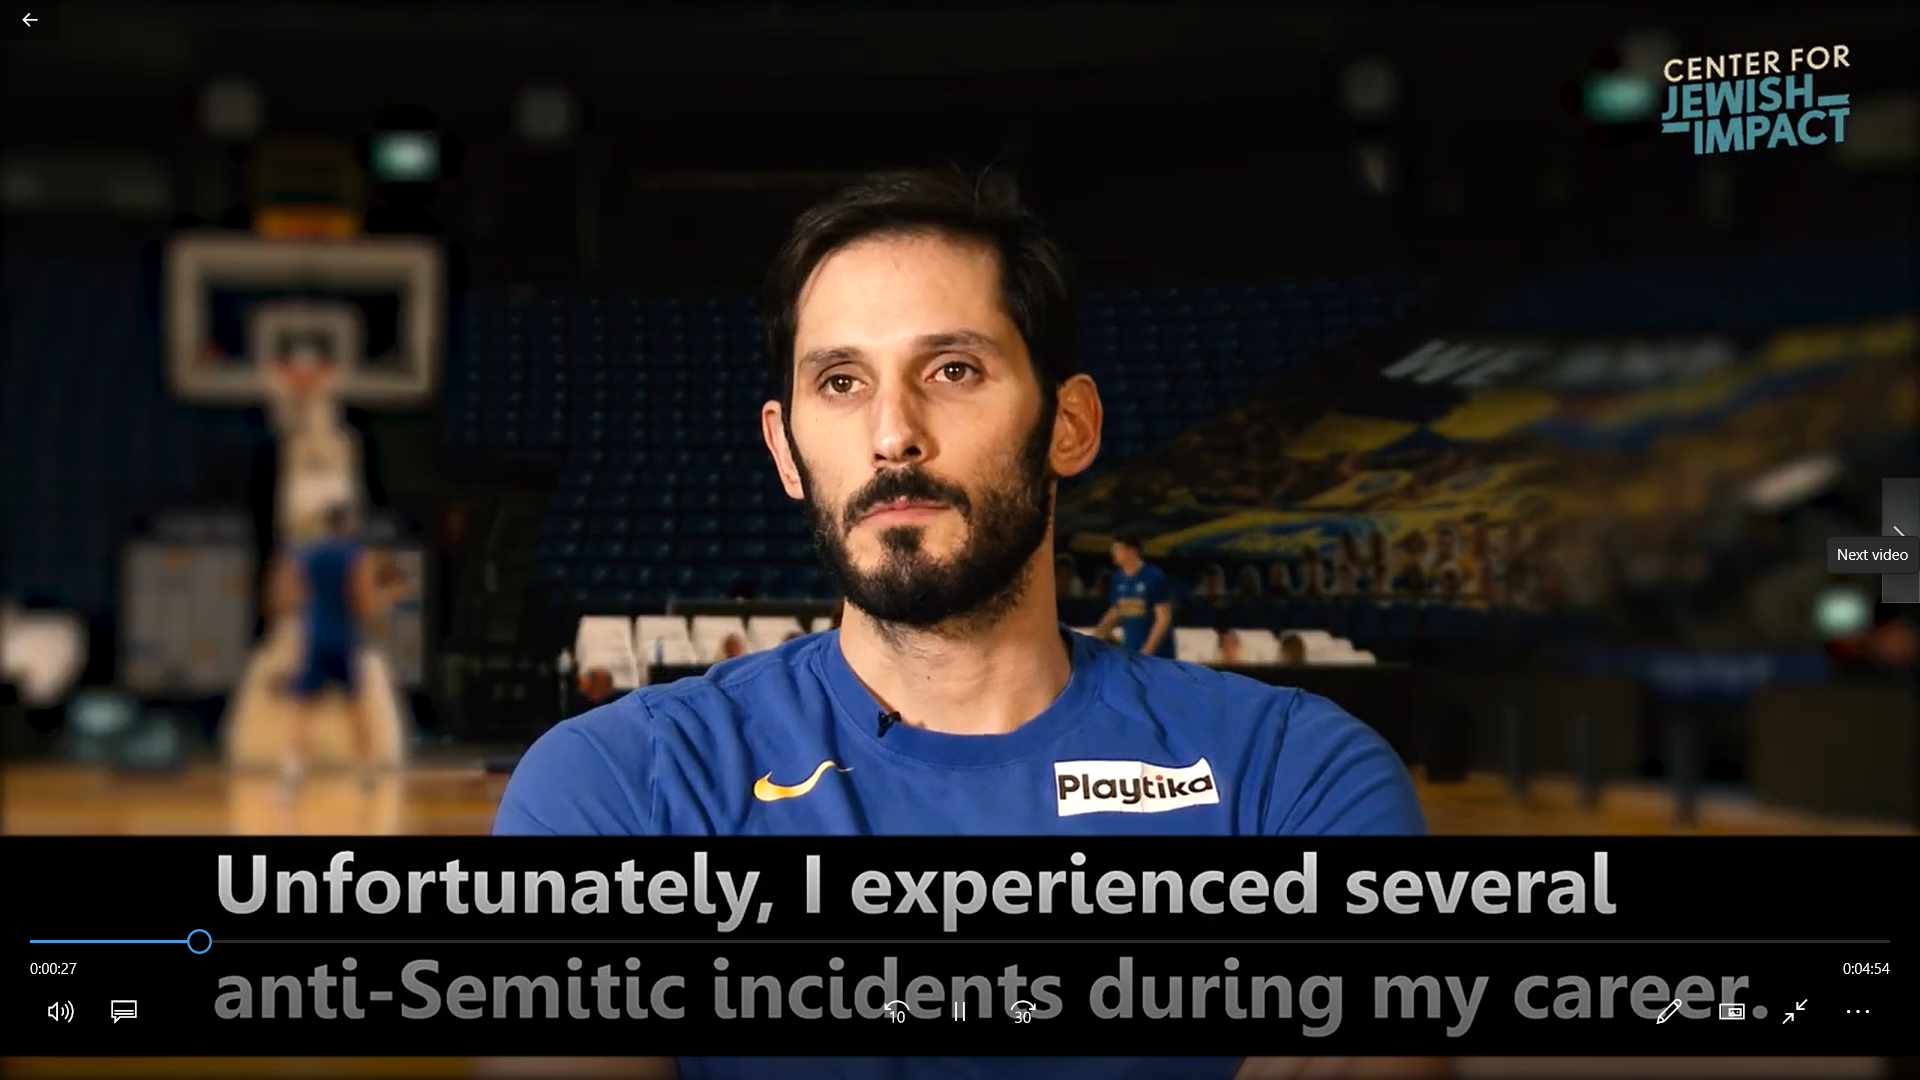 Center for Jewish Impact - Athletes Speak About Anti-Semitism for International Holocaust Remembranc